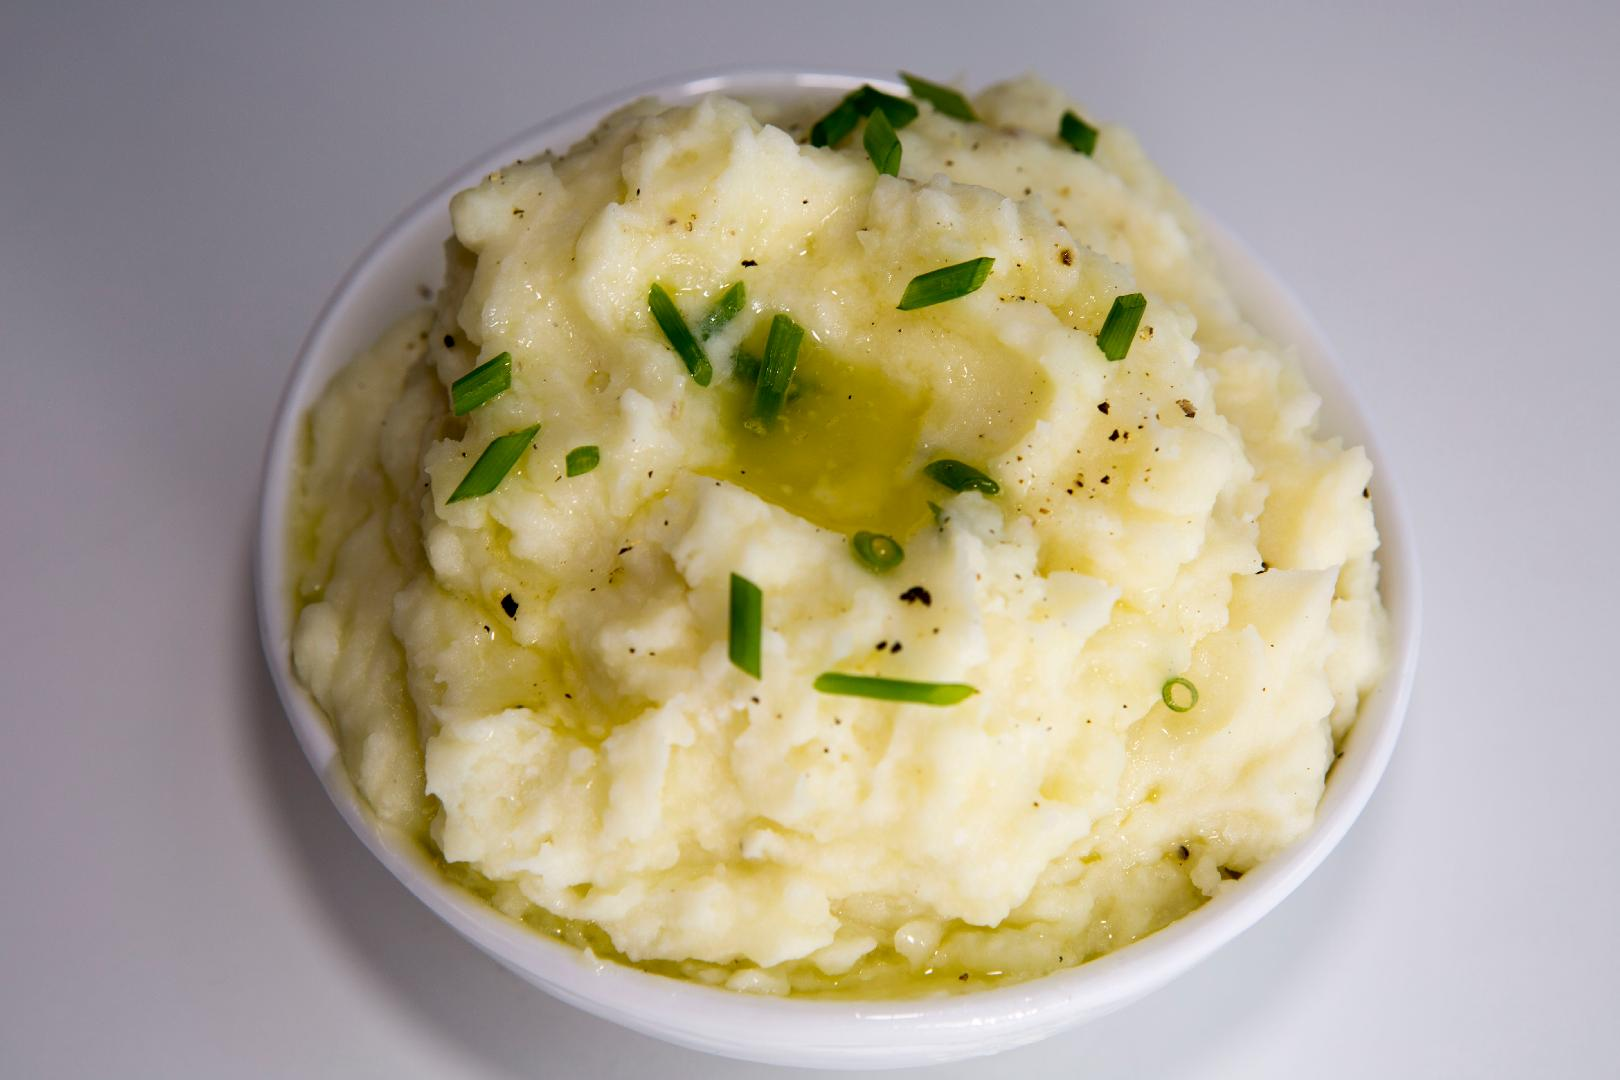 Is It Actually Dangerous to Eat Raw Potato? | MyRecipes